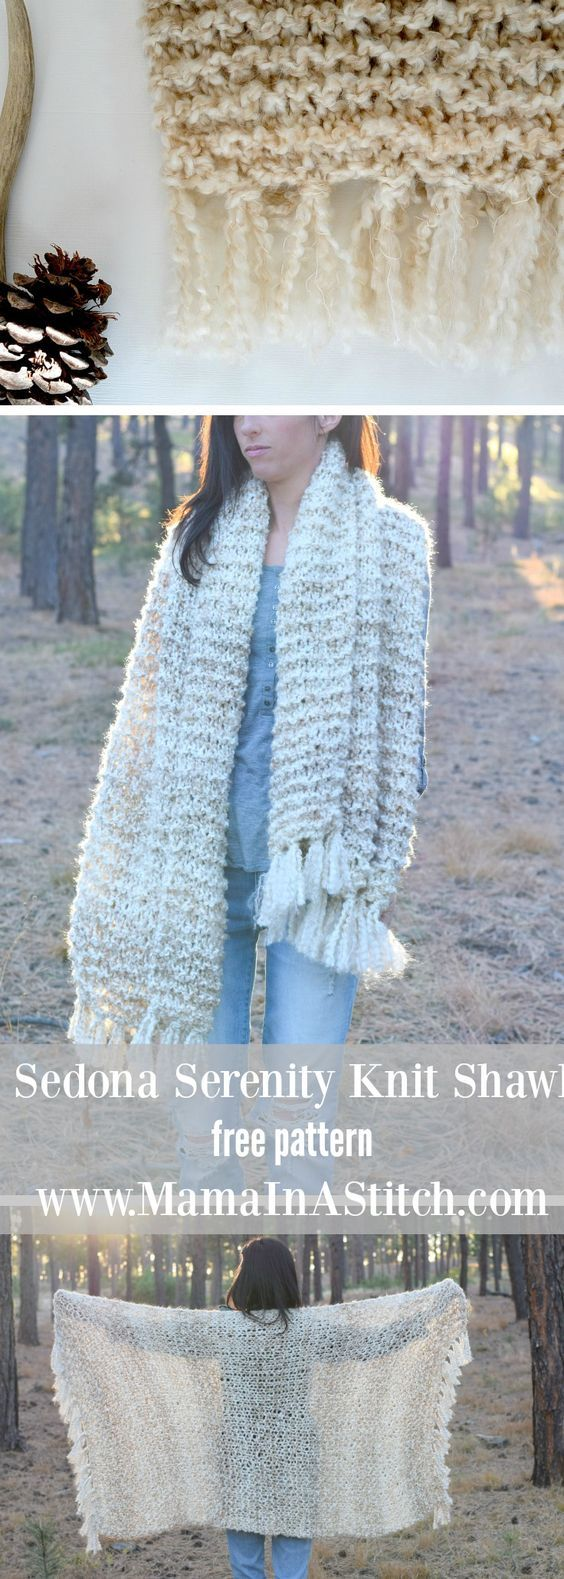 Sedona Serenity Knit Shawl Free Knitting Pattern via @MamaInAStitch ...